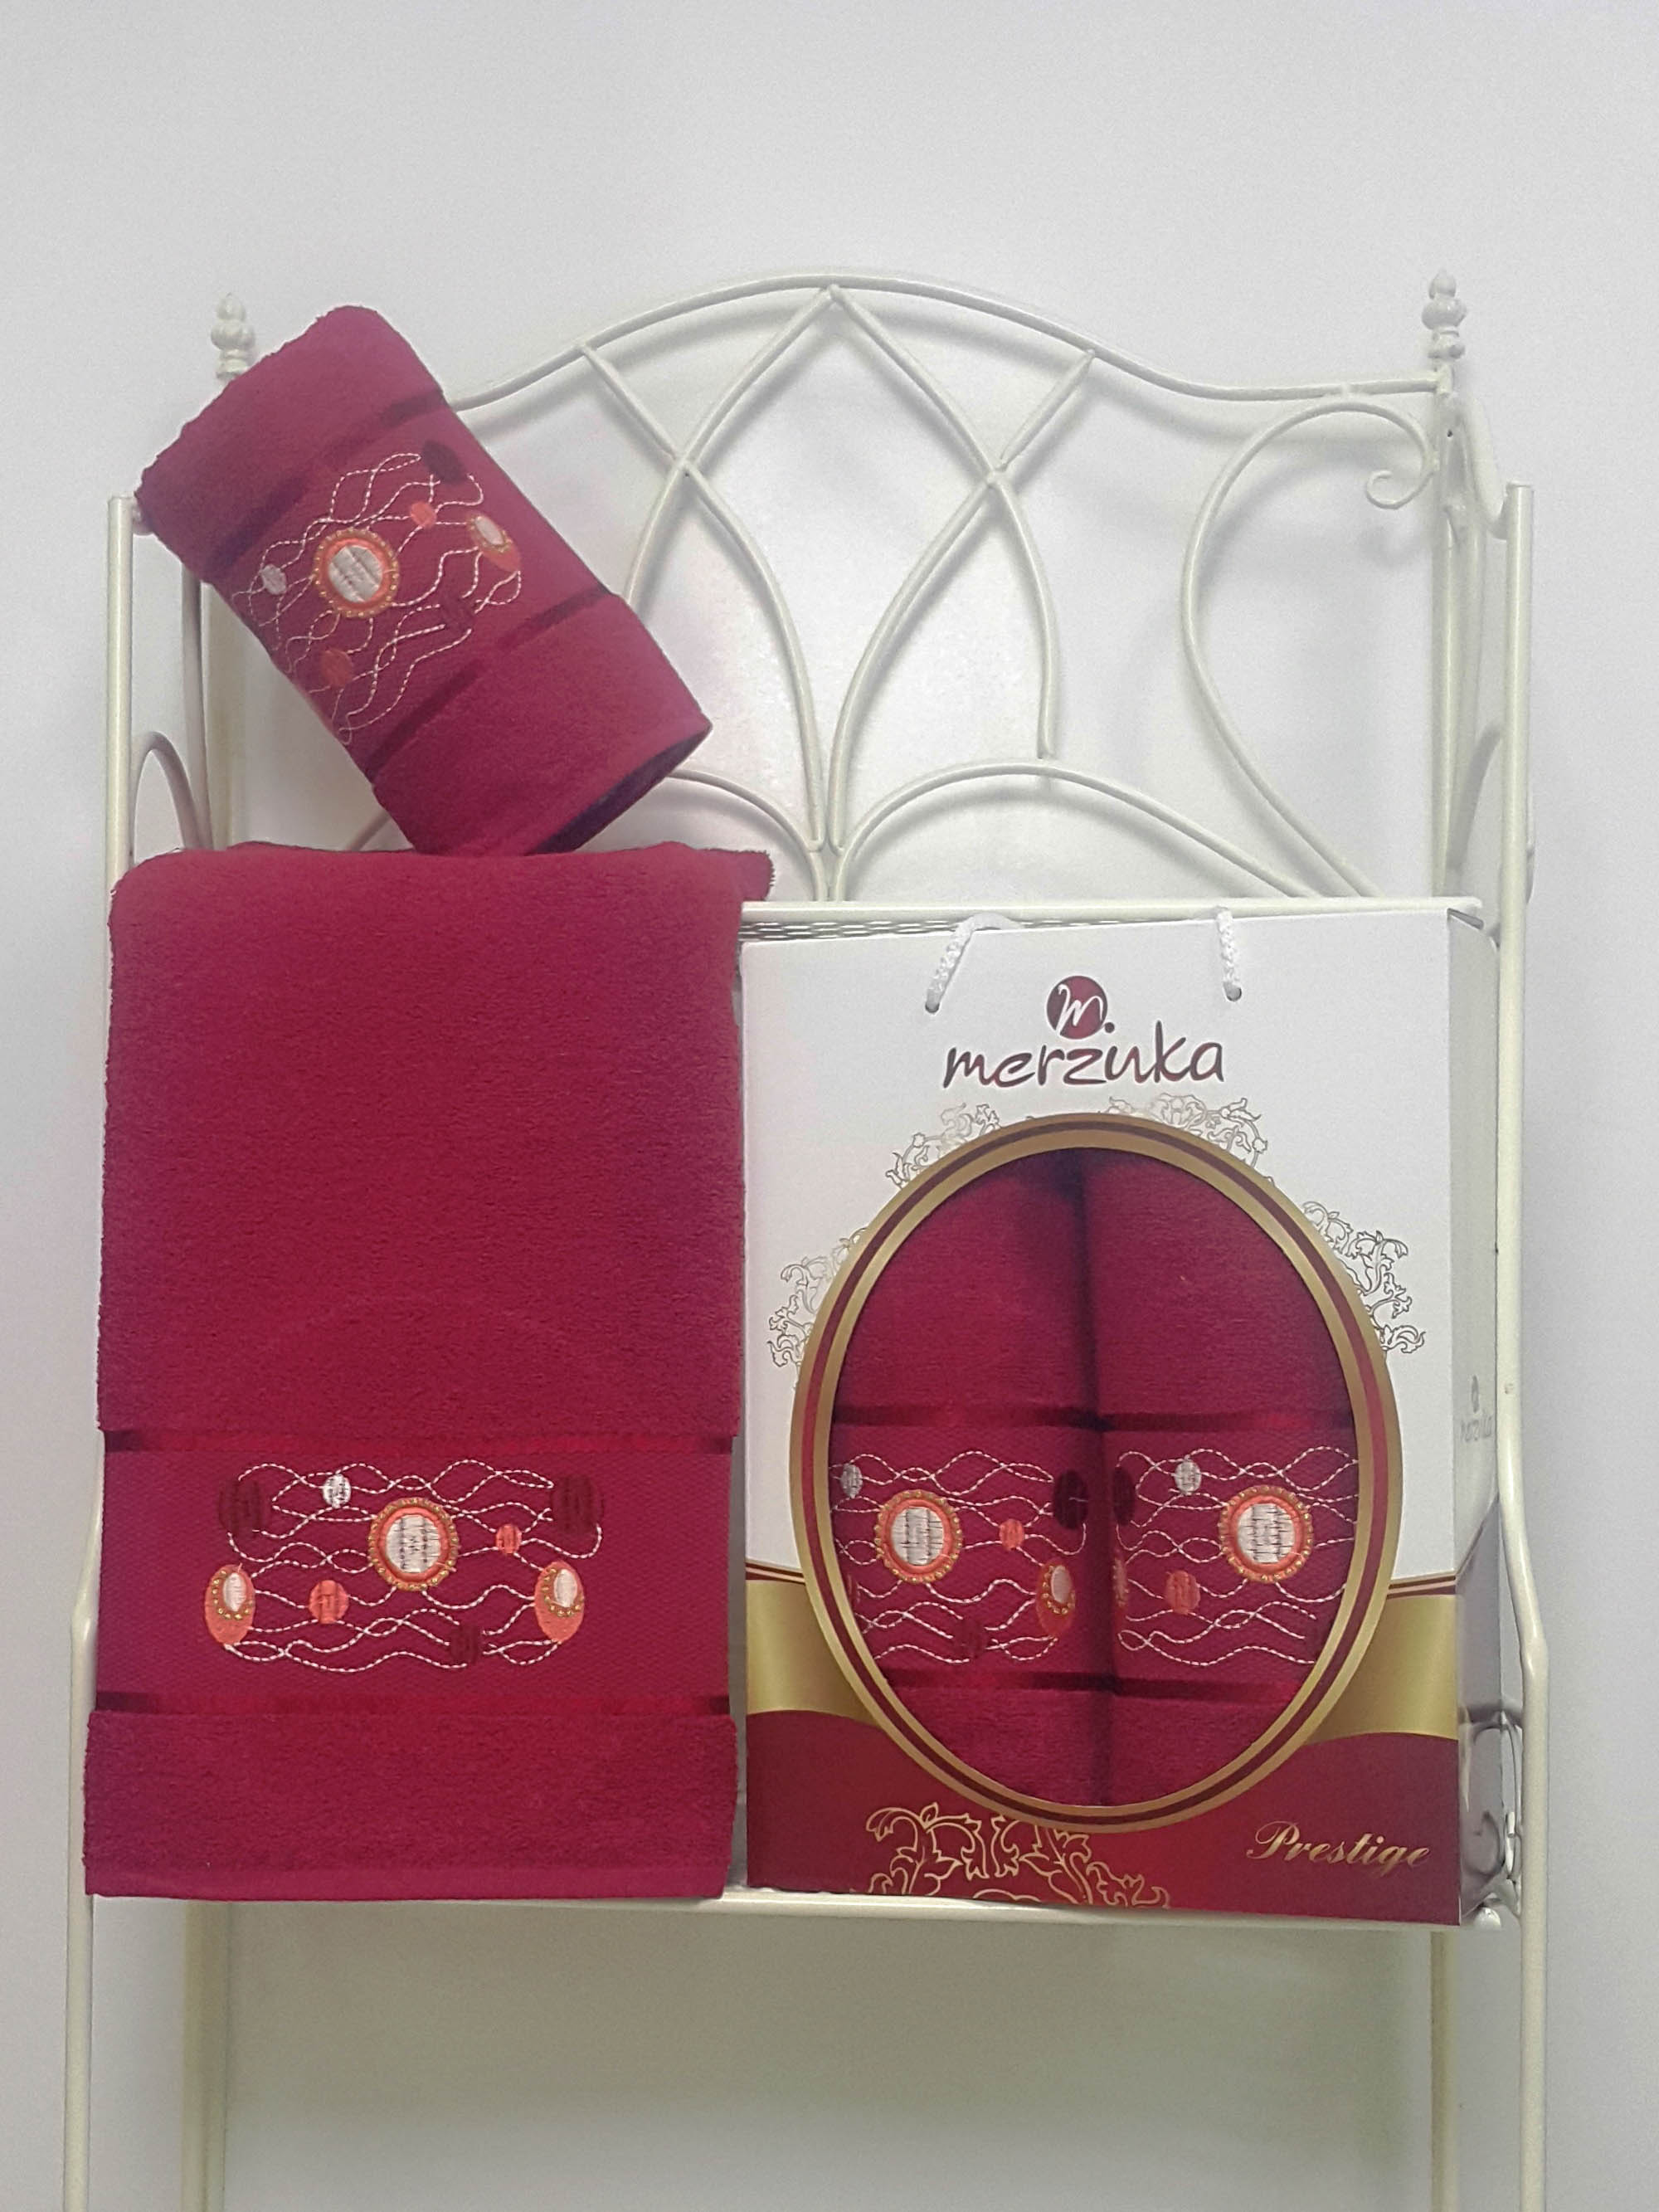 Полотенца Oran Merzuka Набор из 2 полотенец Prestij Цвет: Бордовый набор из 3 полотенец merzuka sakura 50х90 2 70х140 8432 оранжевый